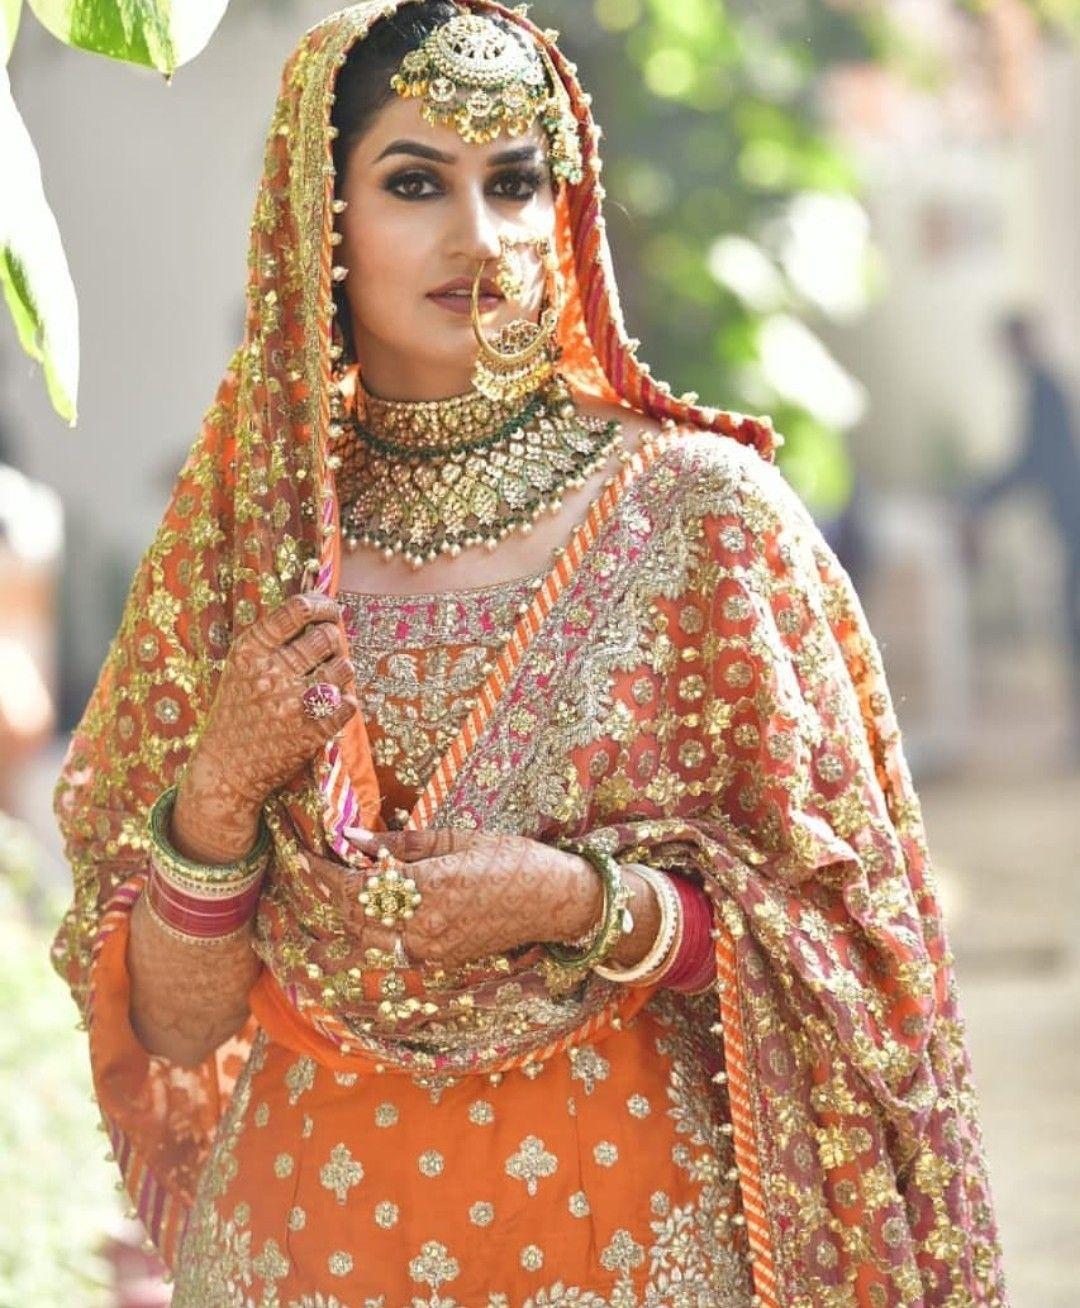 Royal jewels image by Lovepreet Kaur Indian bridal